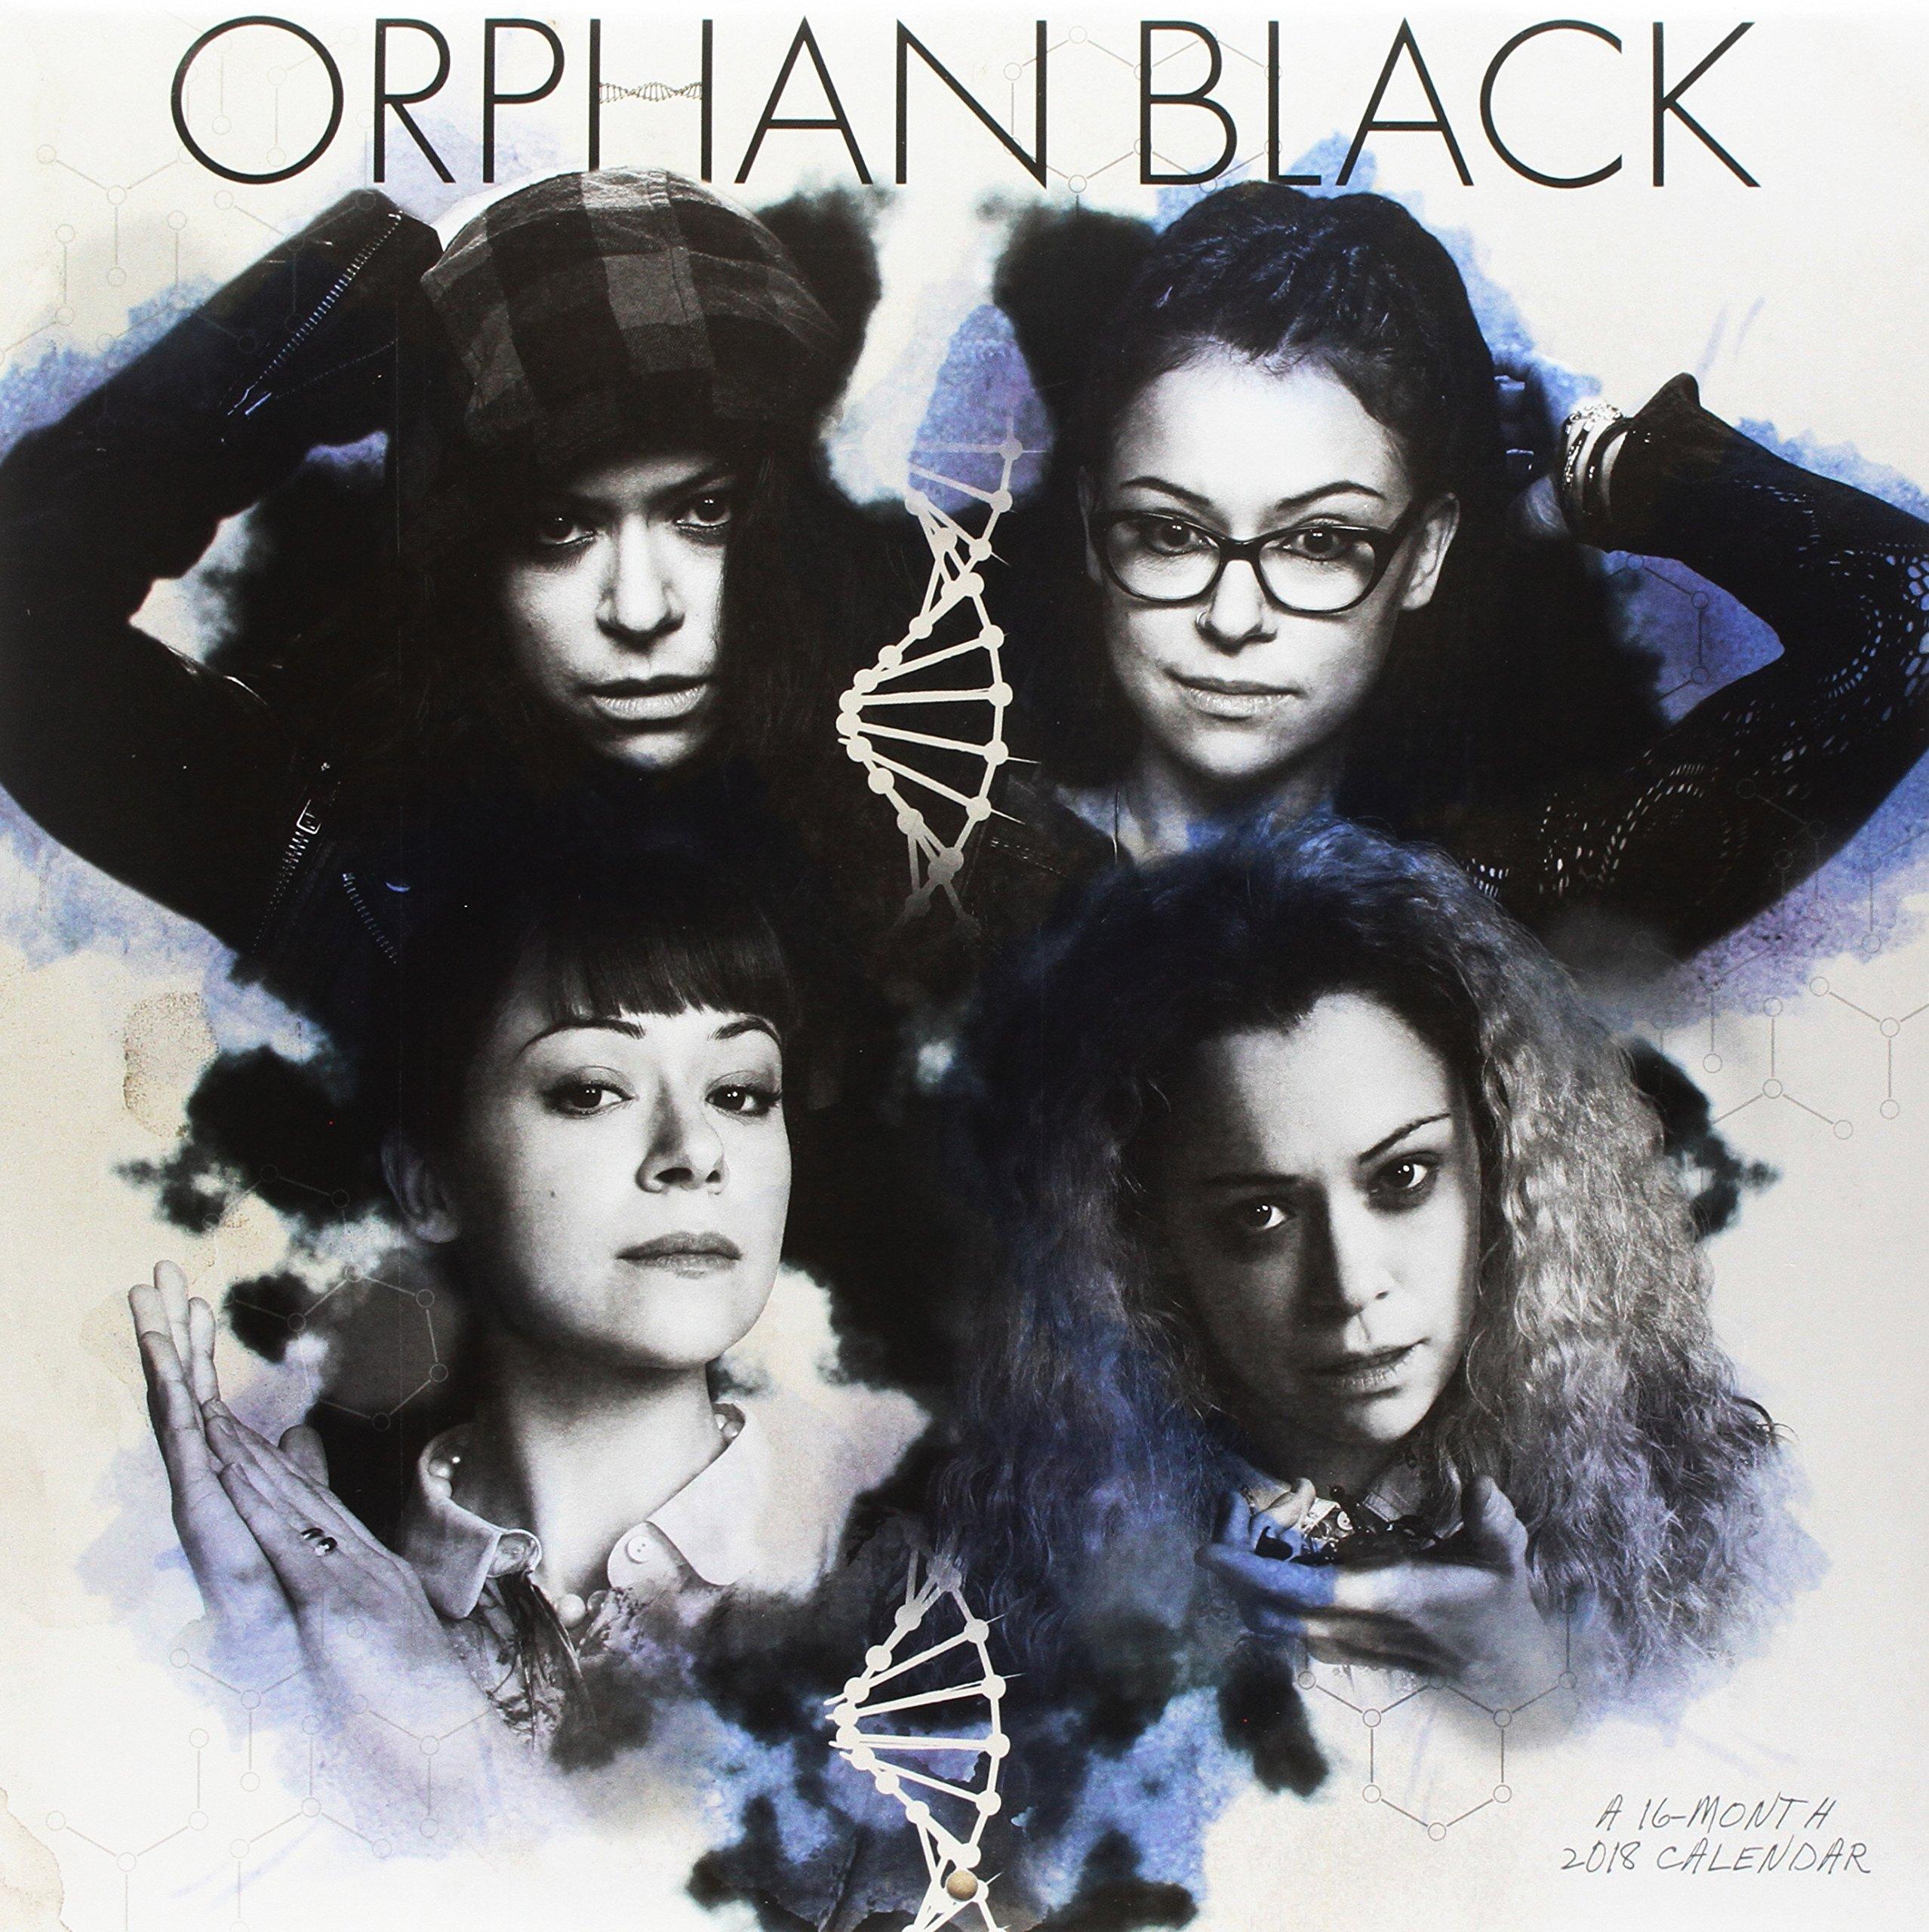 Download Orphan Black 2018 Calendar pdf